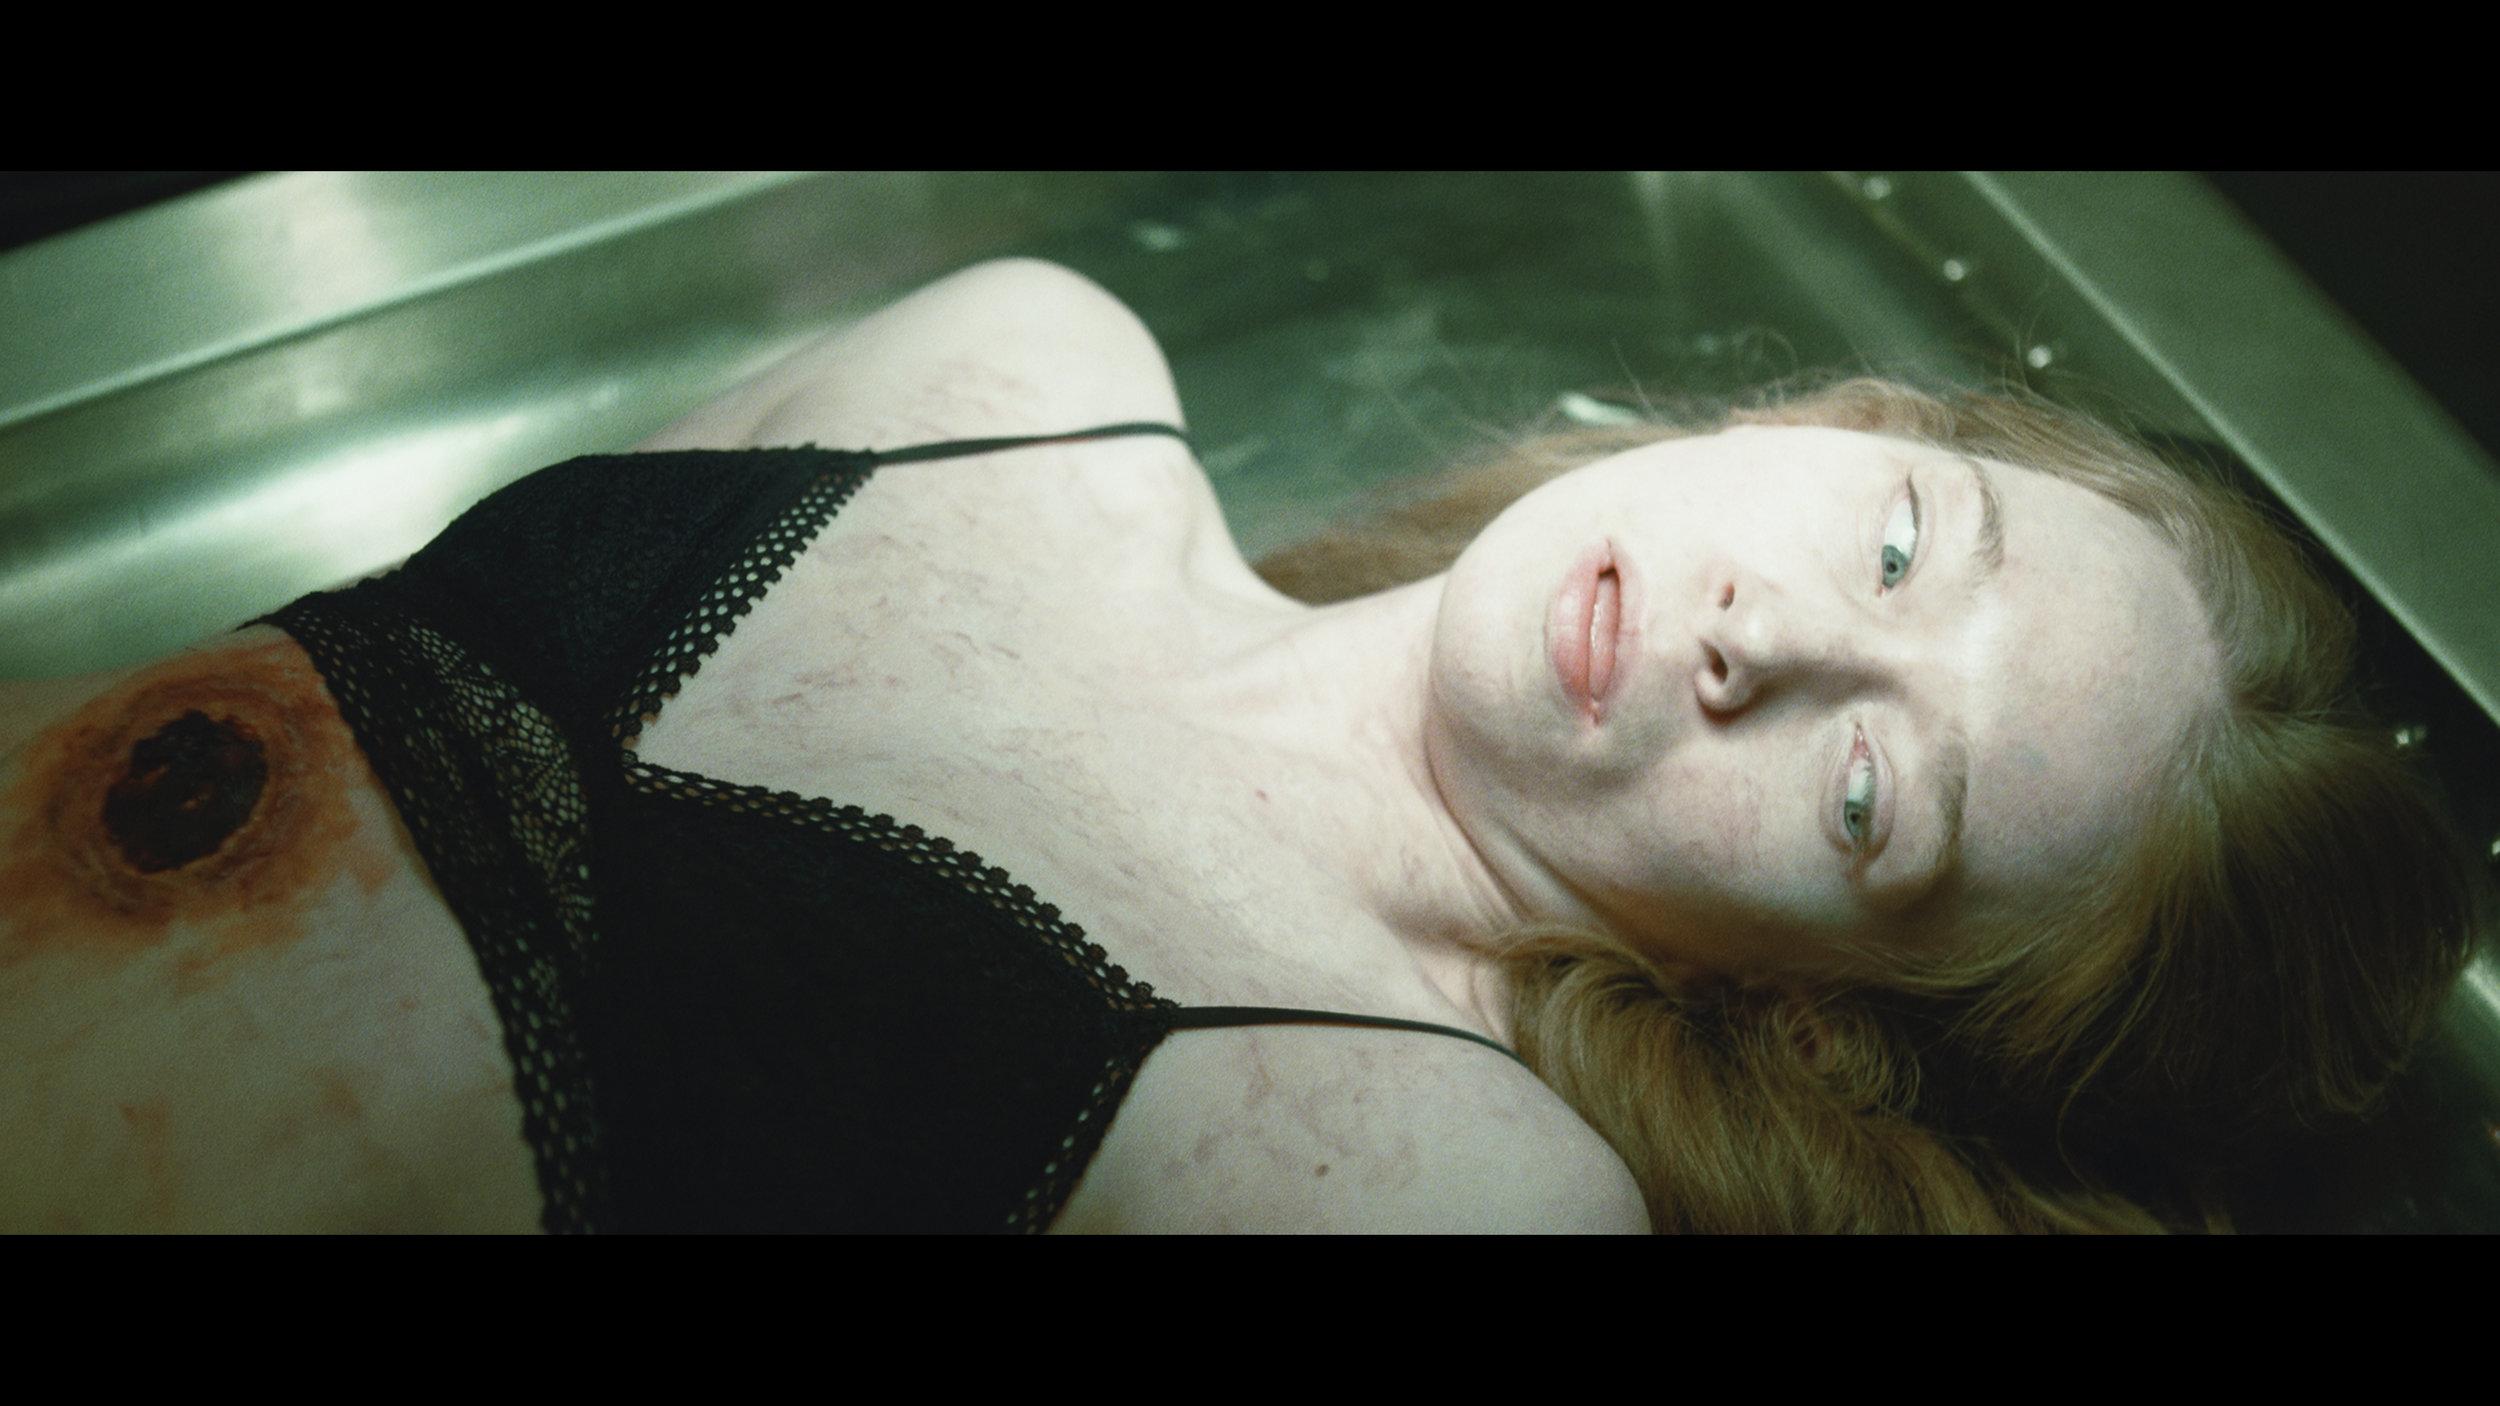 Chris Lake - I Want You 4Kconf NR HL Mar17.01_00_49_10.Still003.jpg